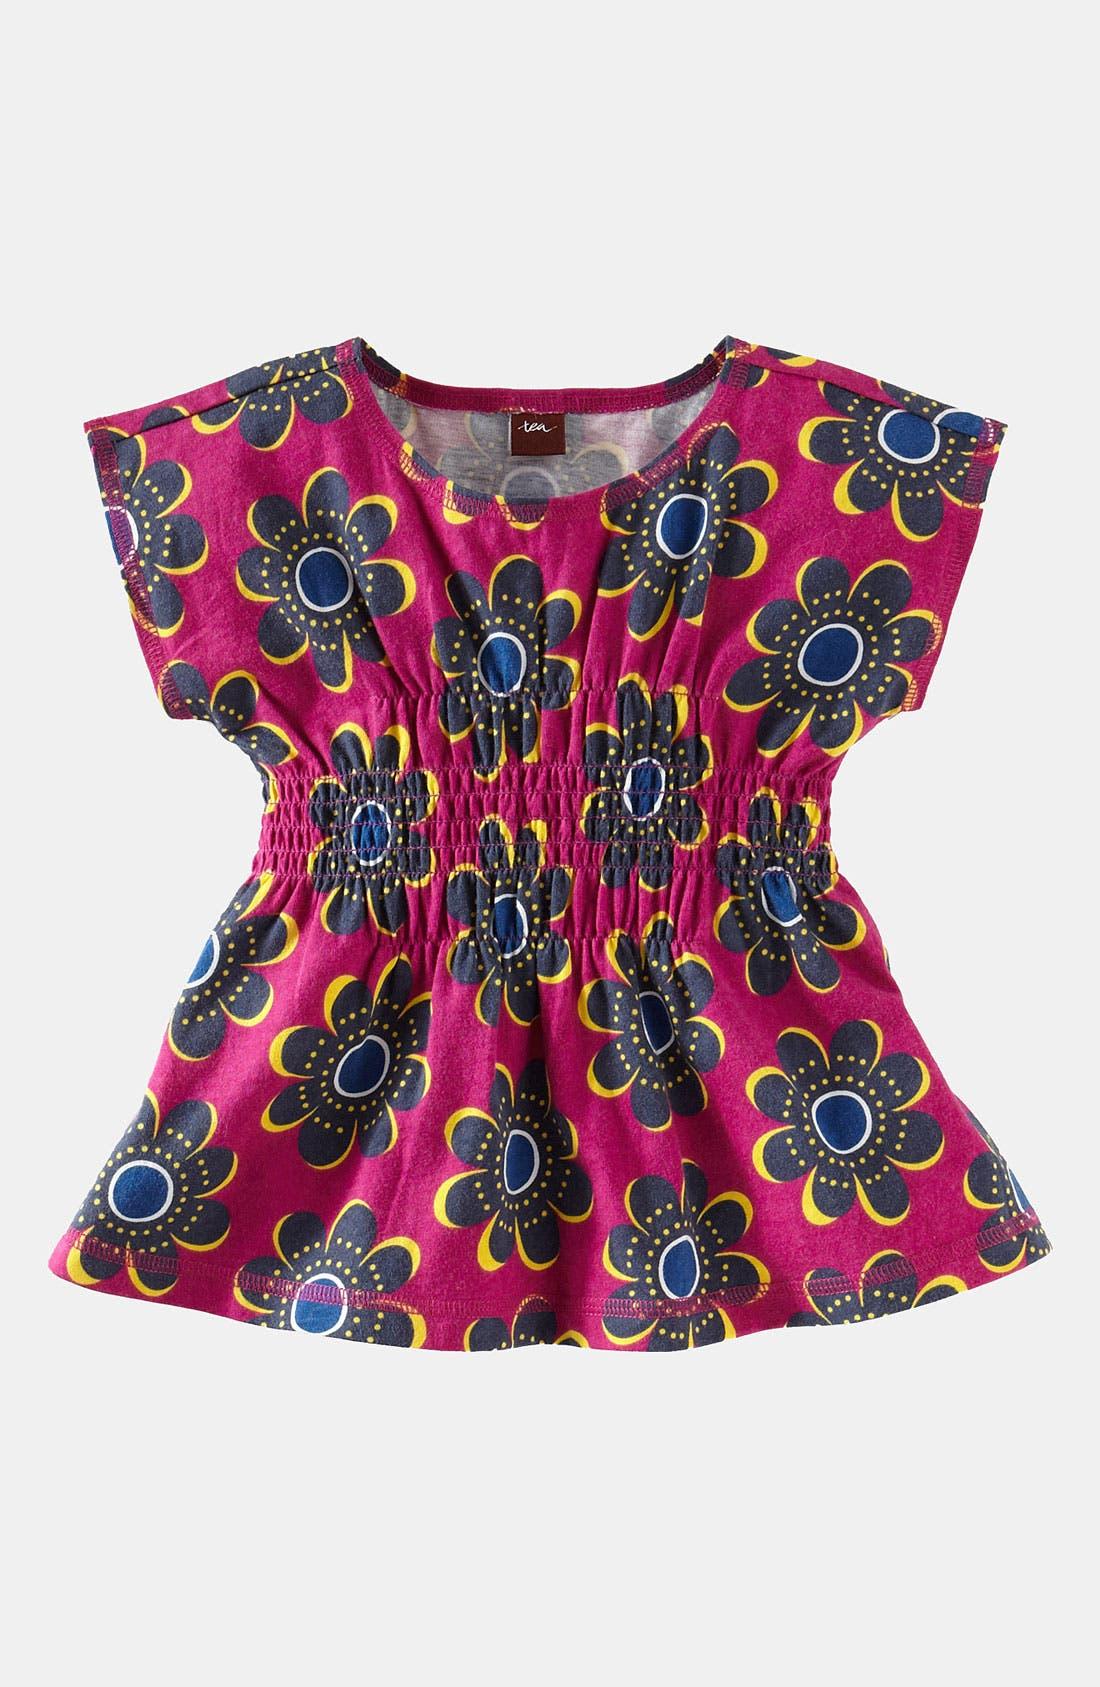 Alternate Image 1 Selected - Tea Collection 'Rosebank' Smocked Top (Little Girls & Big Girls)